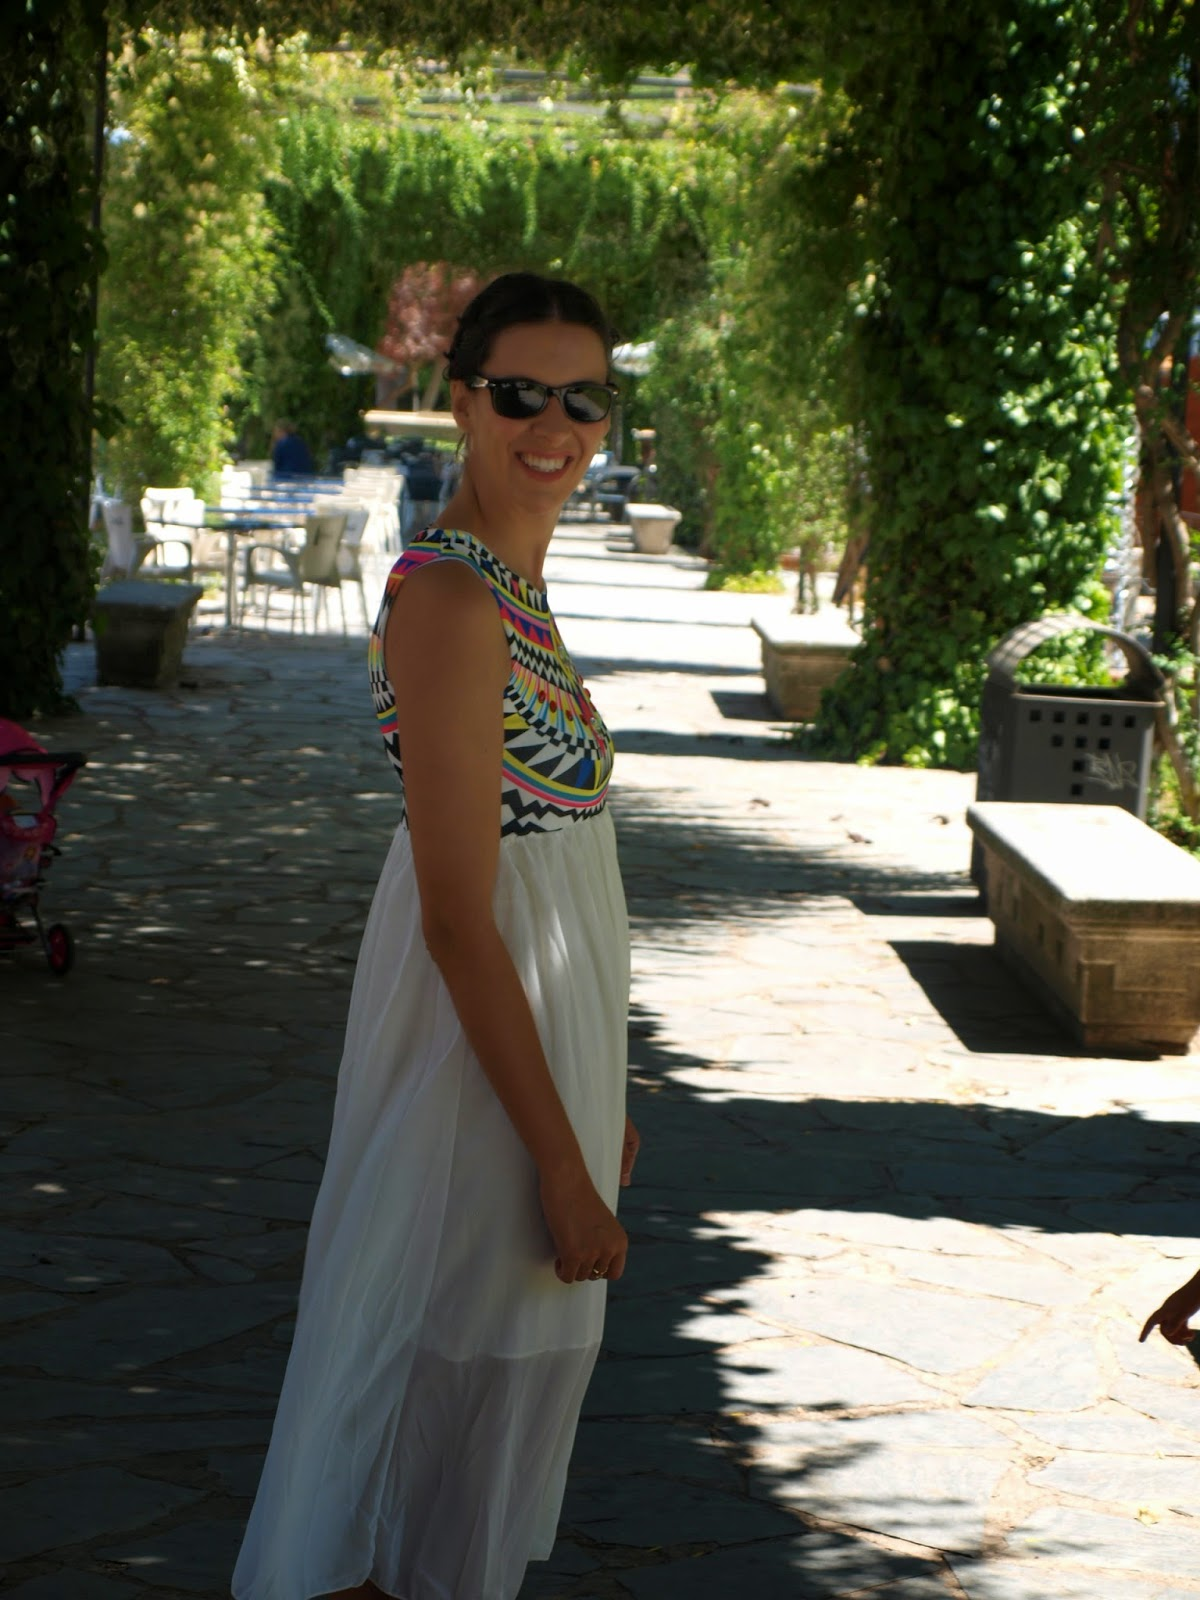 Vestido blanco sheinside